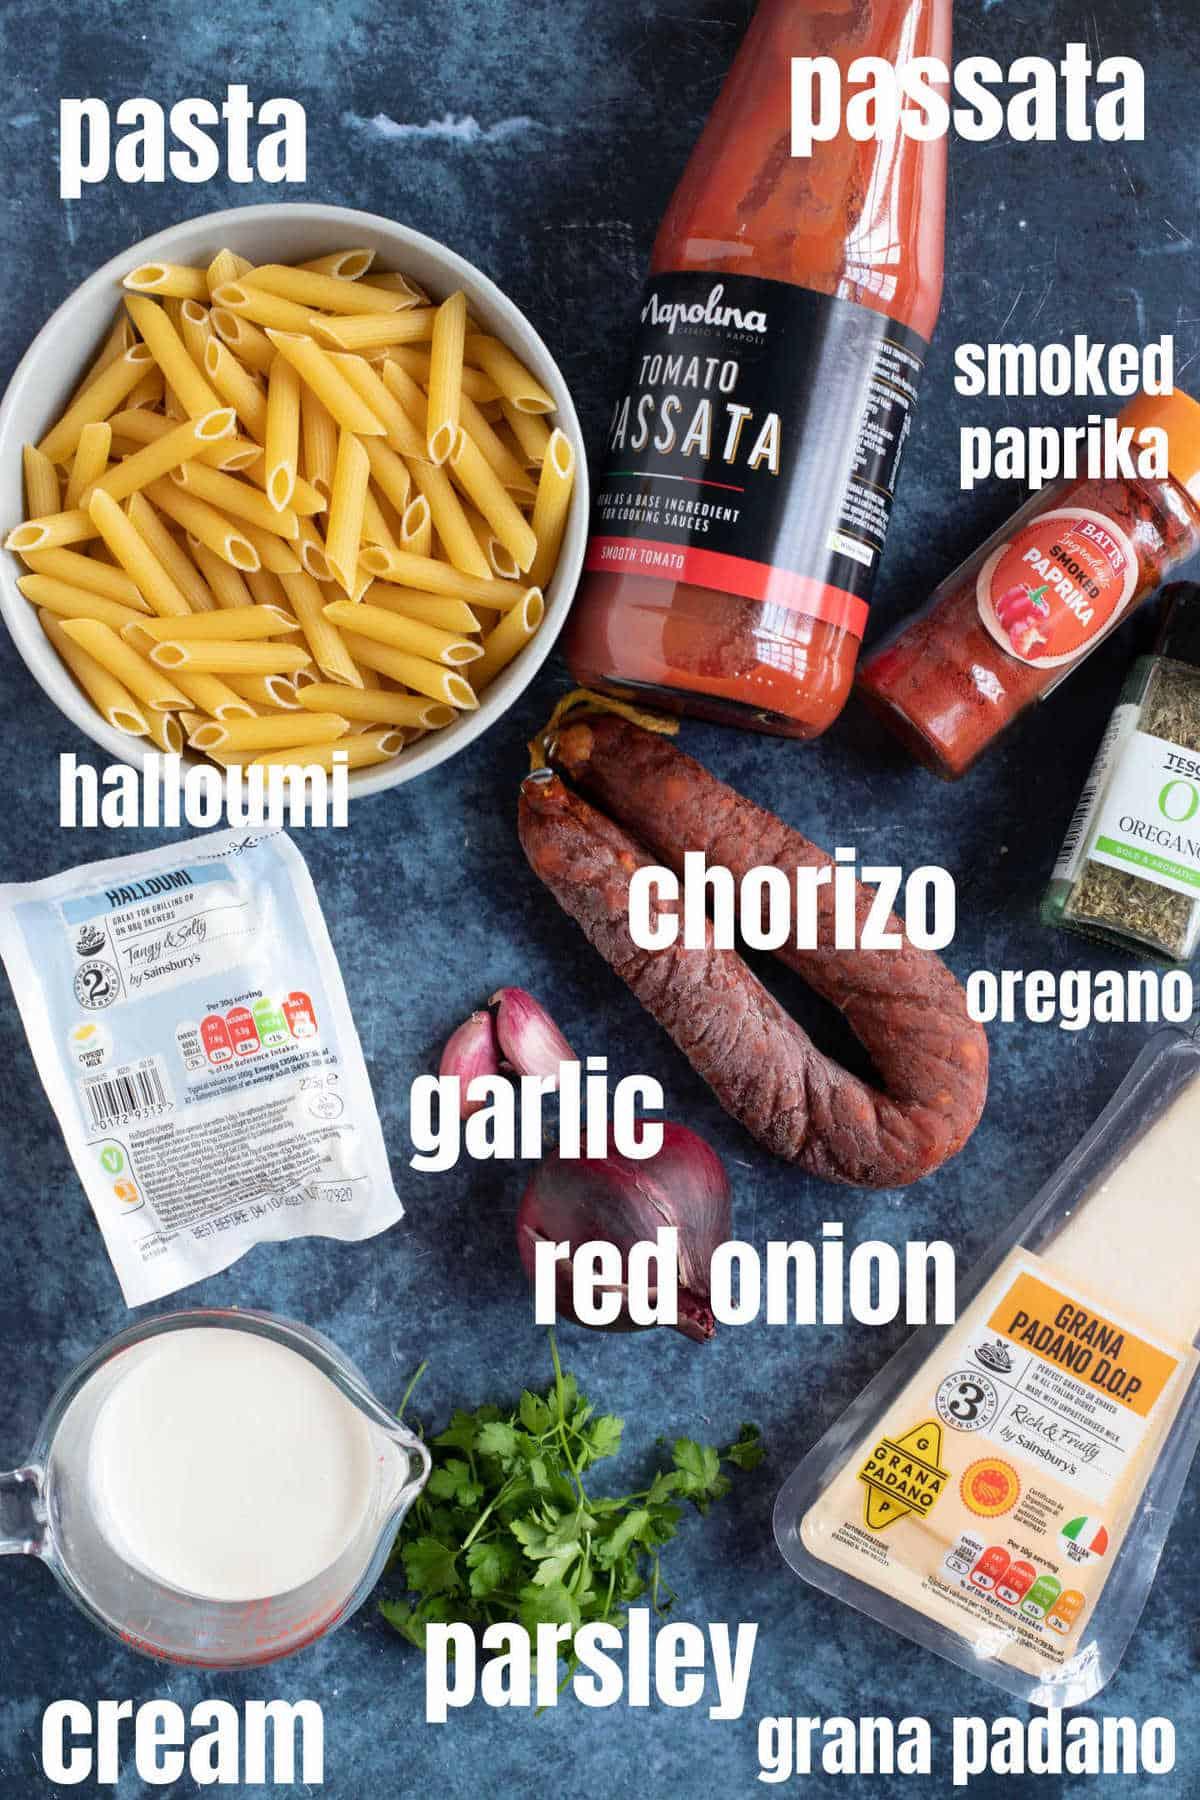 Ingredients for halloumi pasta.